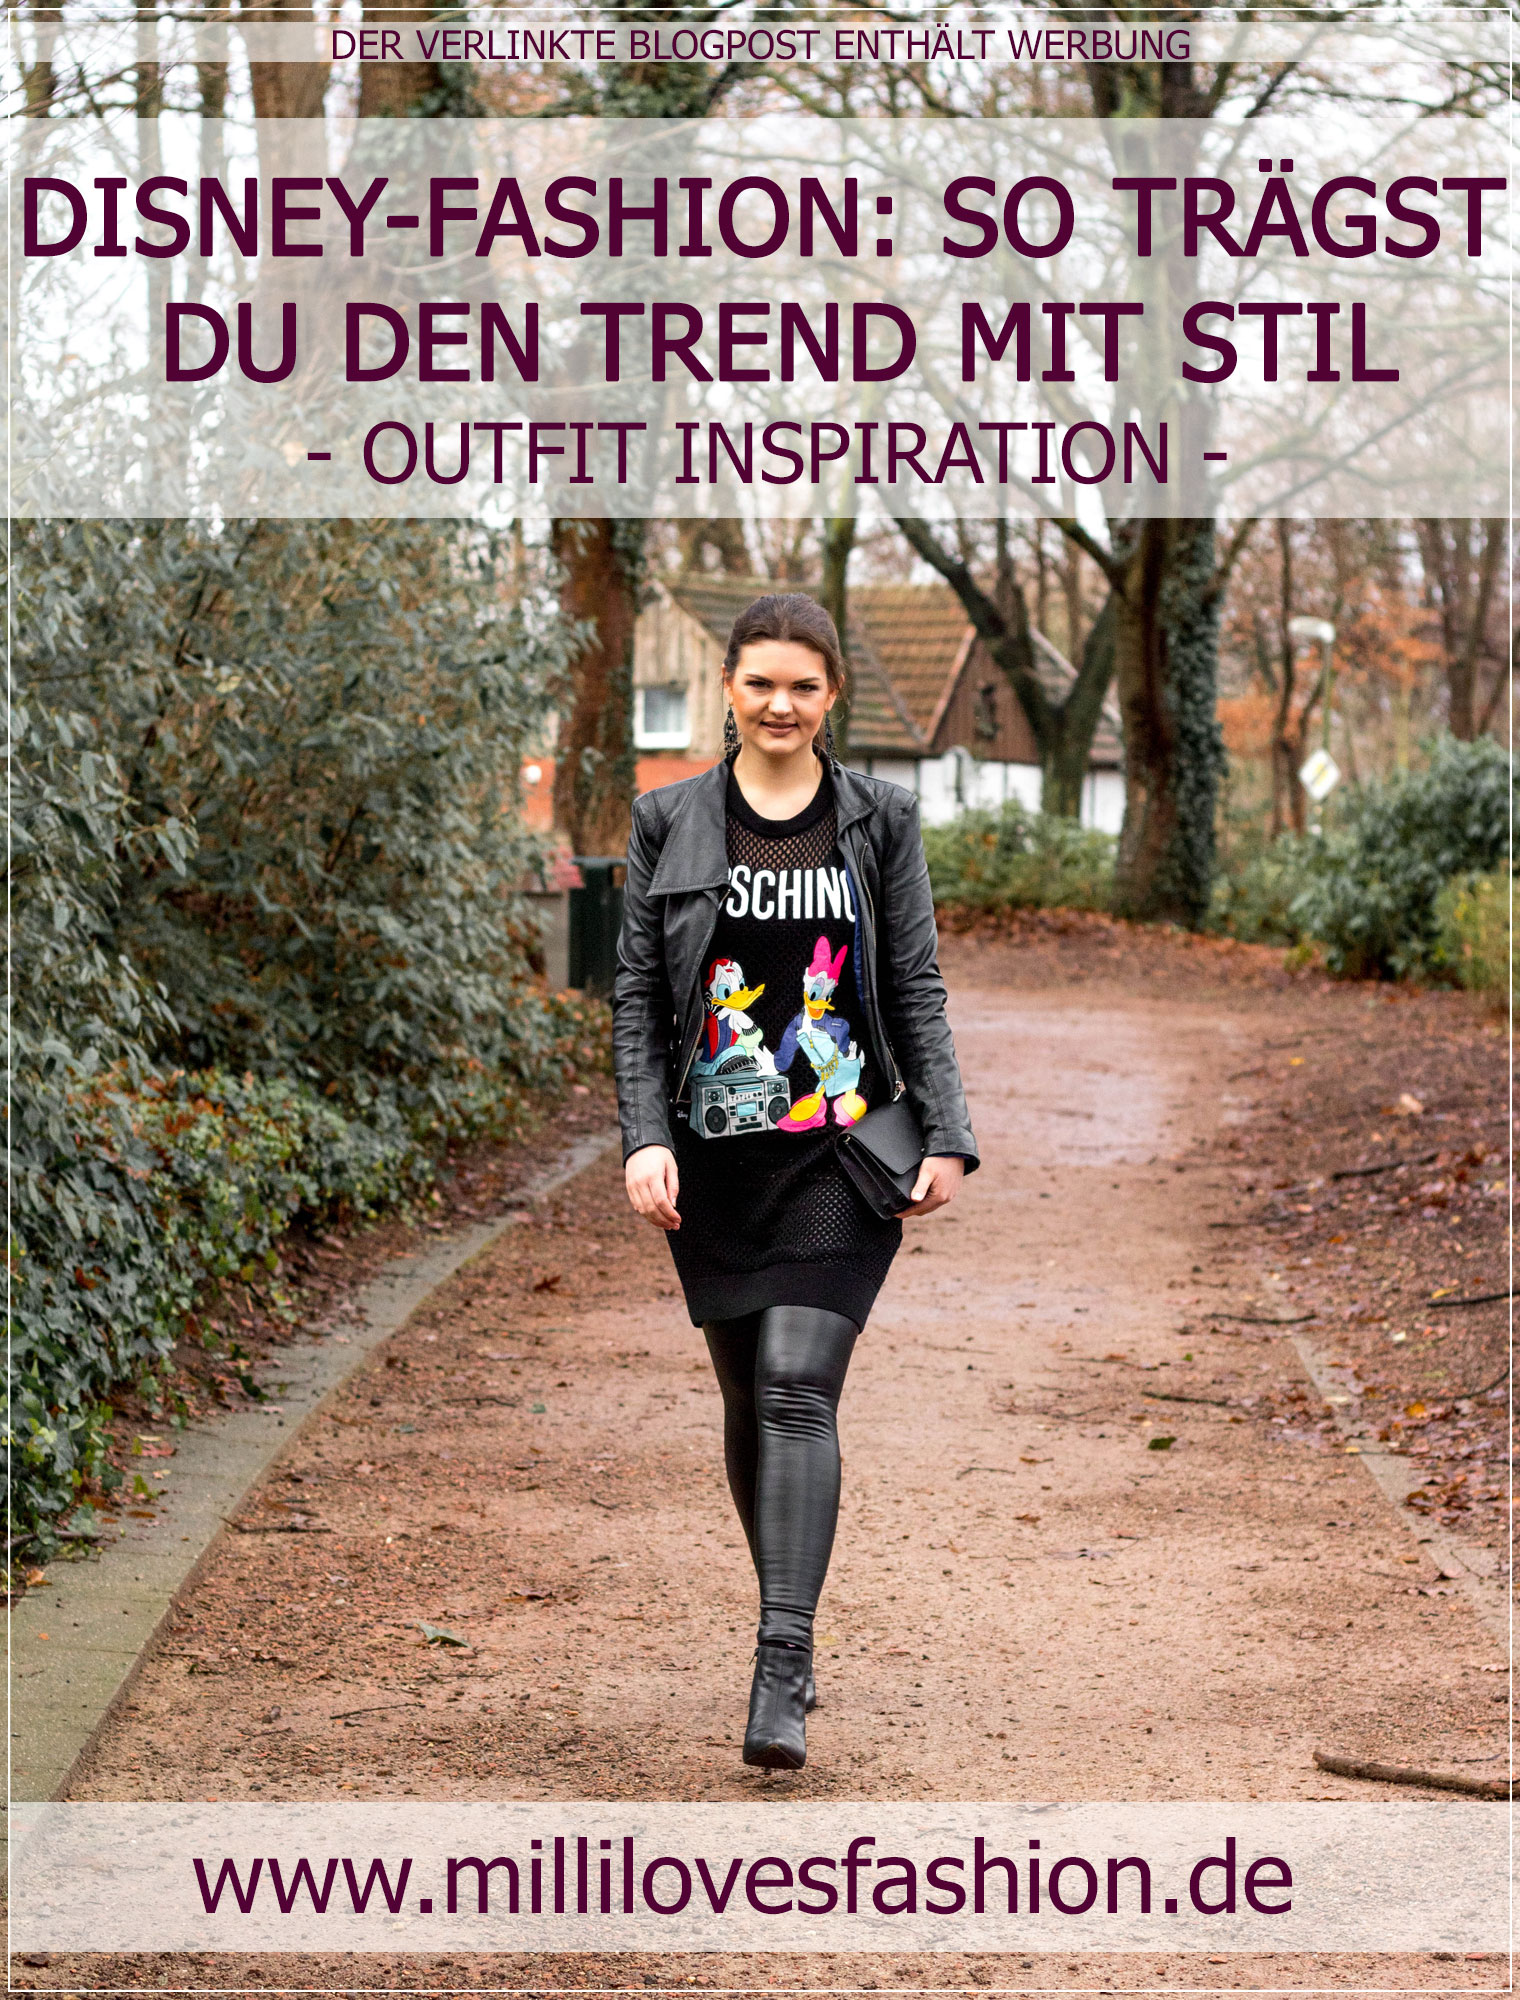 Disney-Print, Disney-Fashion, Disney, Disney-Mode, Modetrend, Styleguide, Outfitinspiration, Winterstyle, Alltagslook, Modebloggerin, Fashionbloggerin, Modeblog, Ruhrgebiet